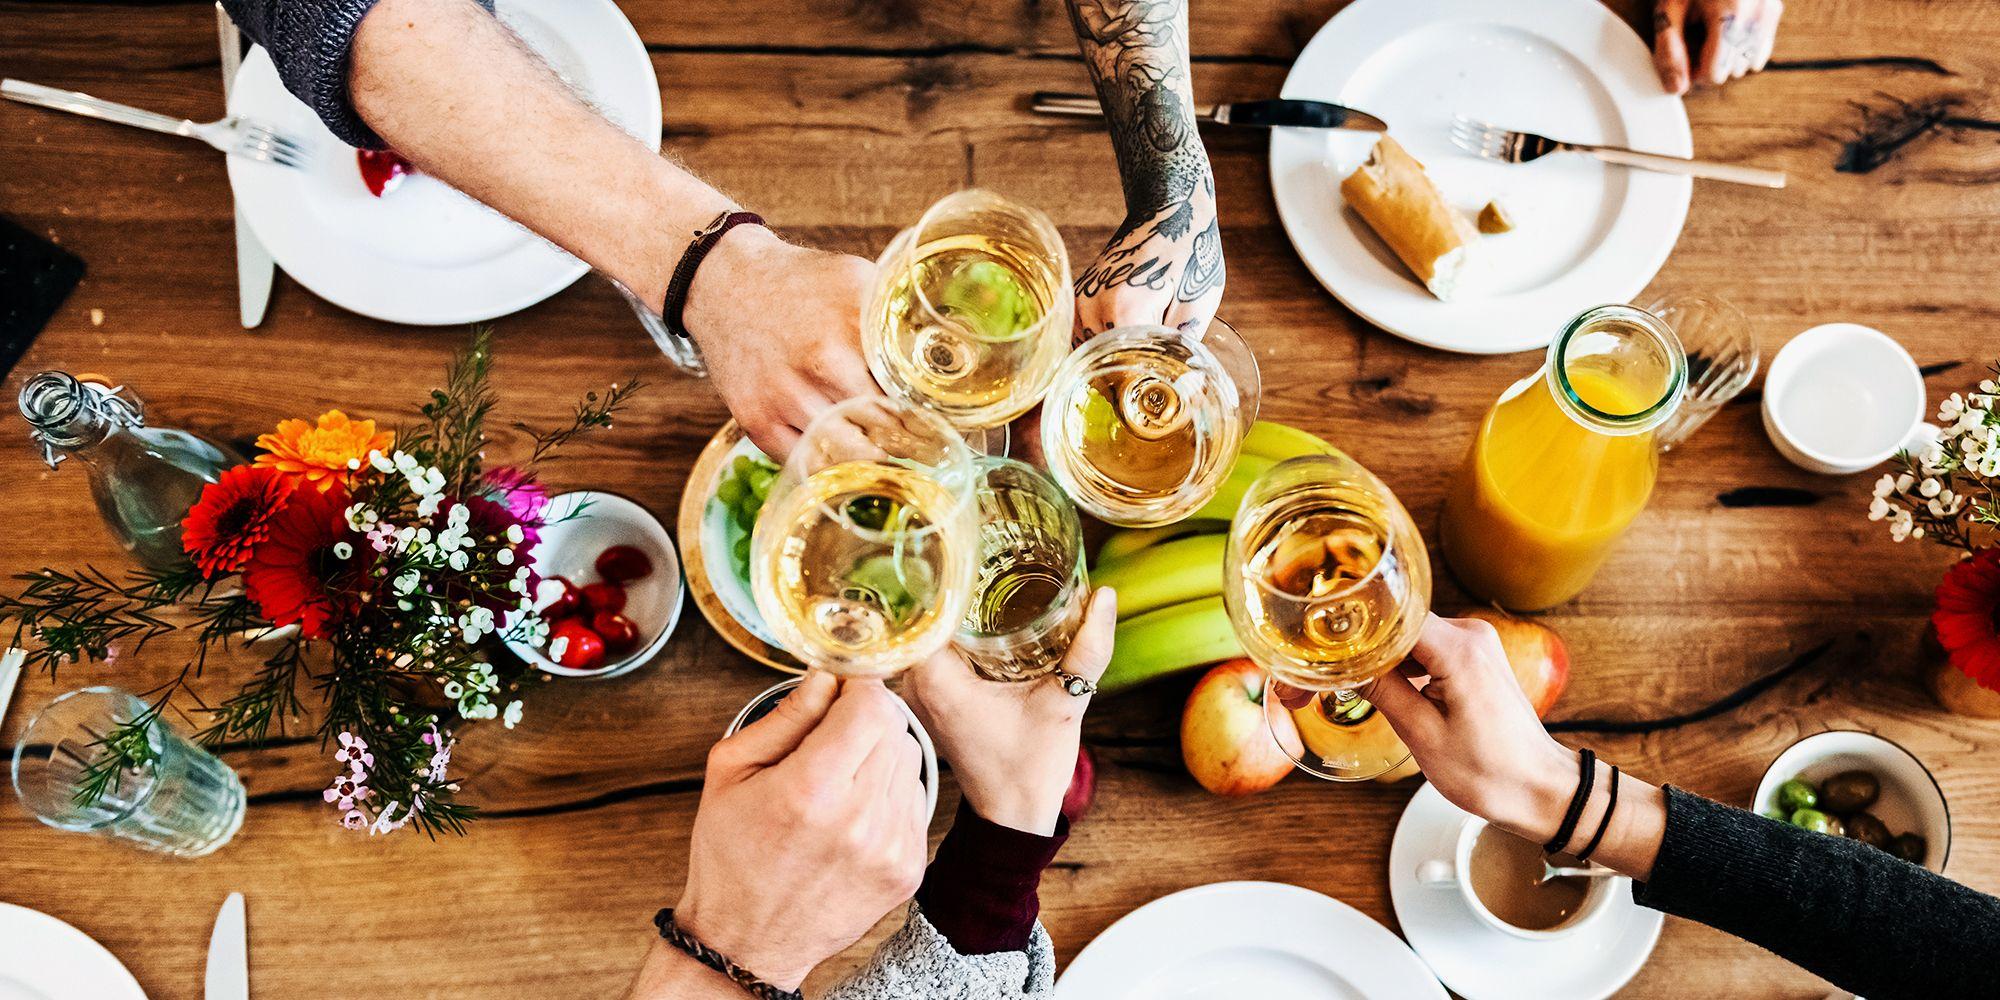 9 Best White Wines to Drink in 2020 - Good White Wines Under $35